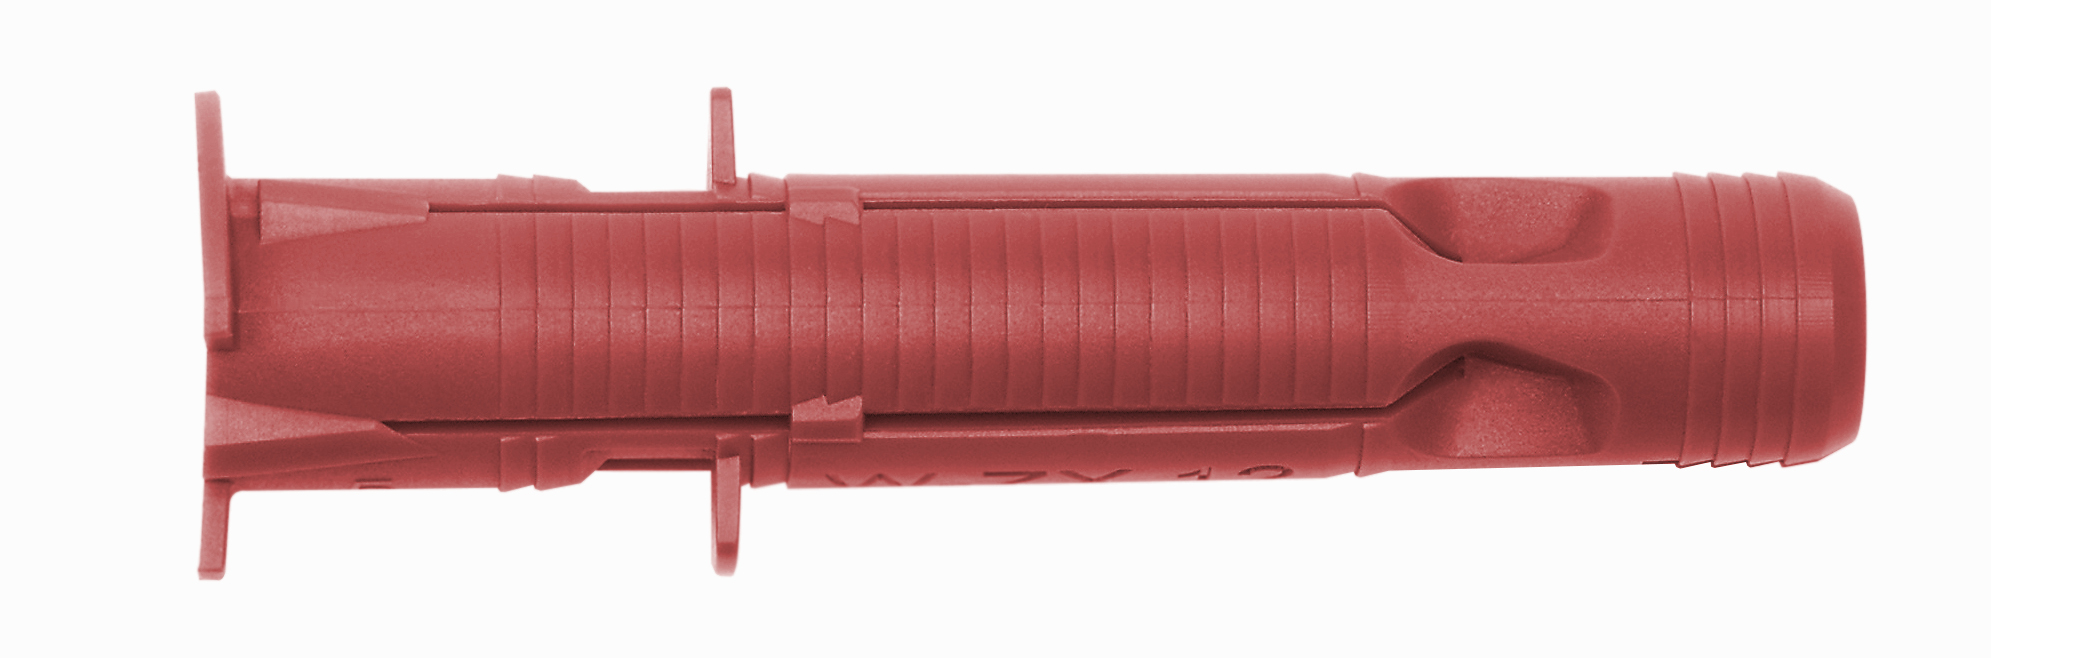 200 Stk ZEBRA universal-Nylondübel ZX-Kunststoff 8x46mm GI90620846